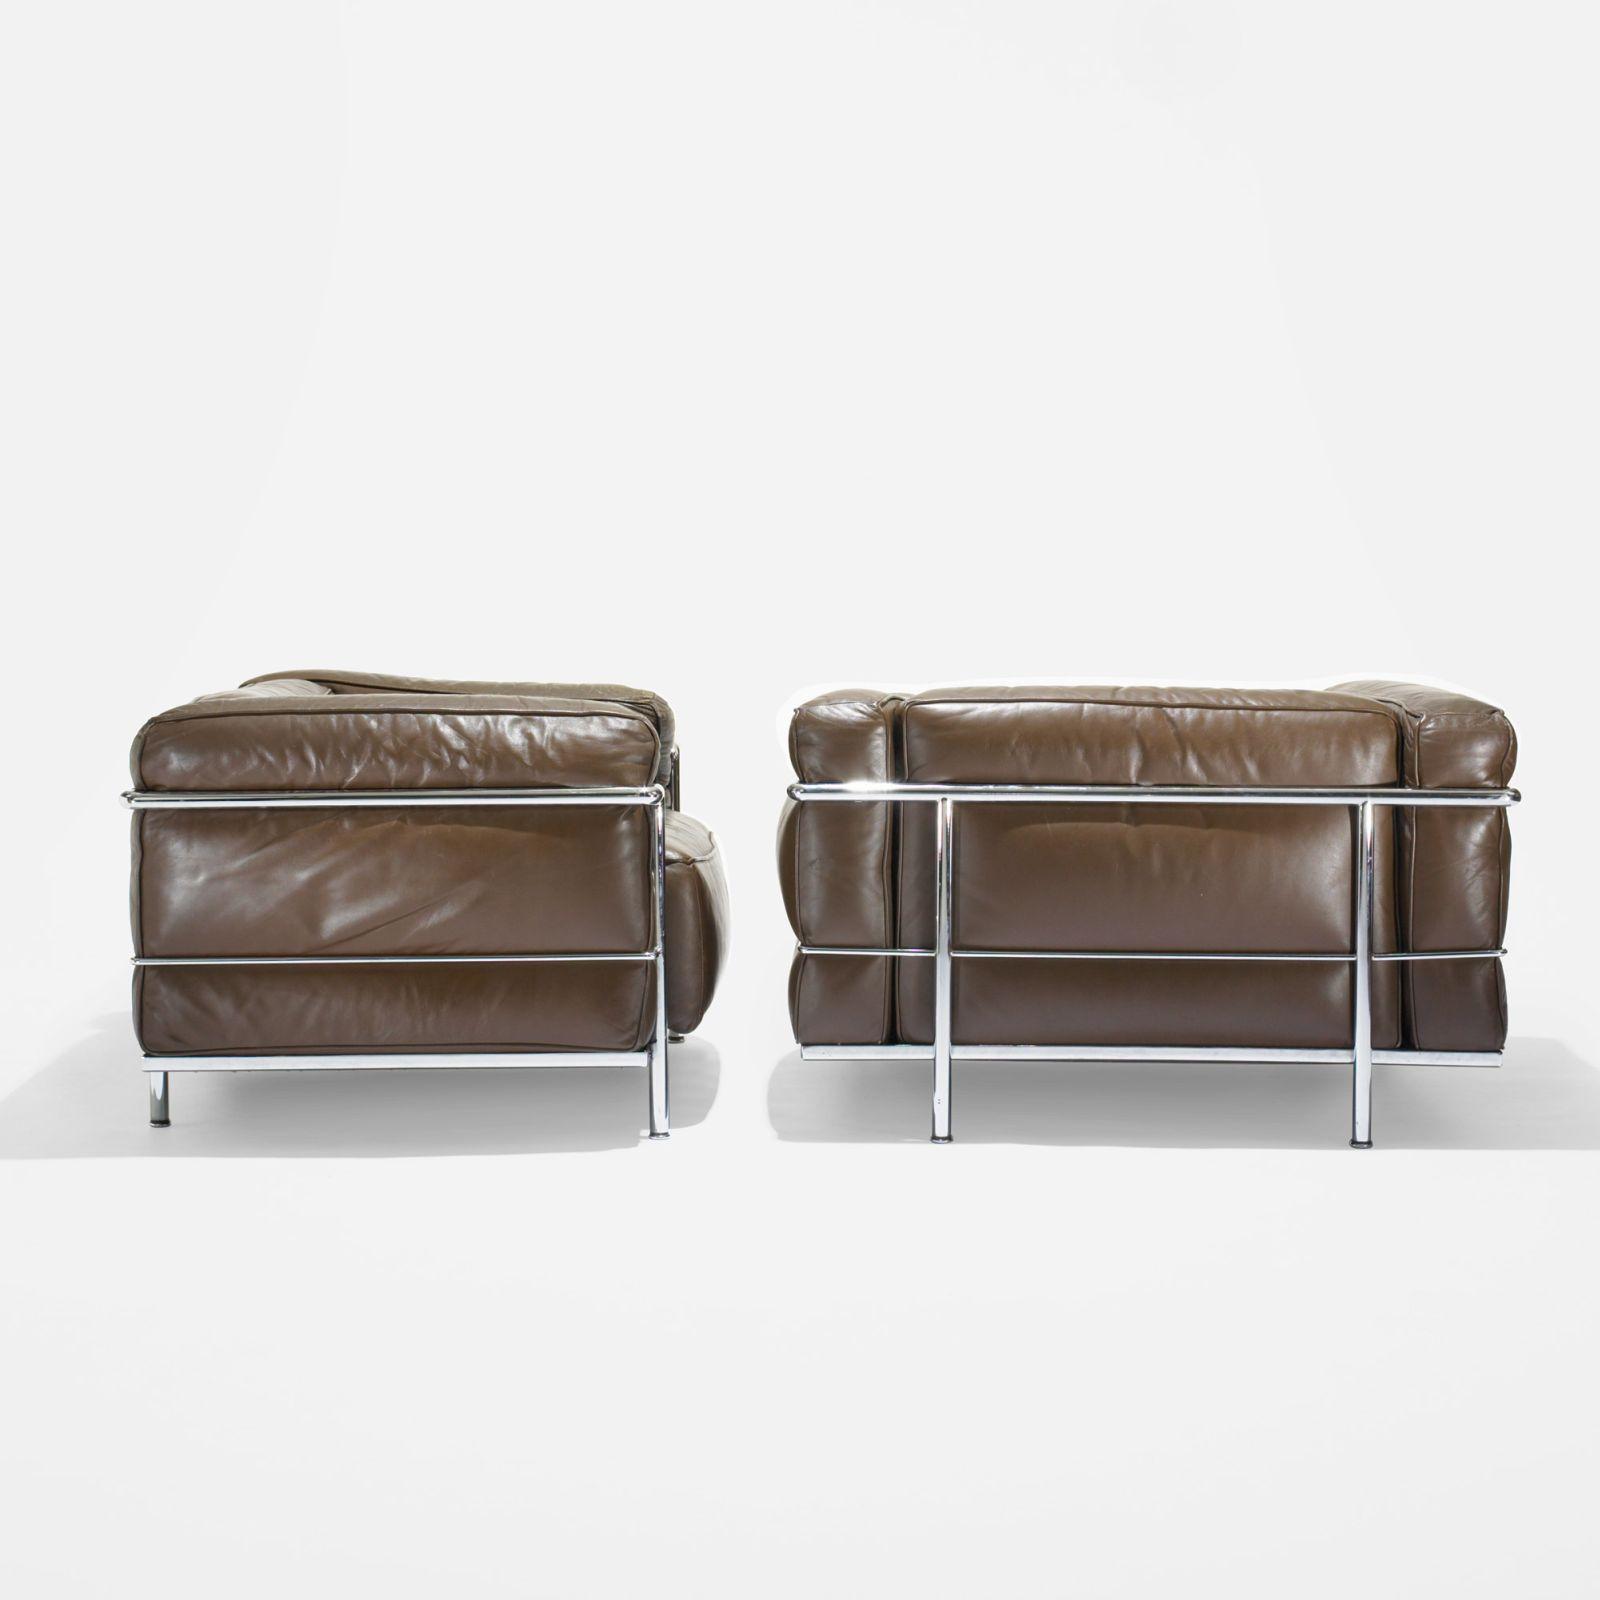 Terrific Pierre Jeanneret Charlotte Perriand And Le Corbusier Grand Comfort Lounge Chairs Pair Inzonedesignstudio Interior Chair Design Inzonedesignstudiocom